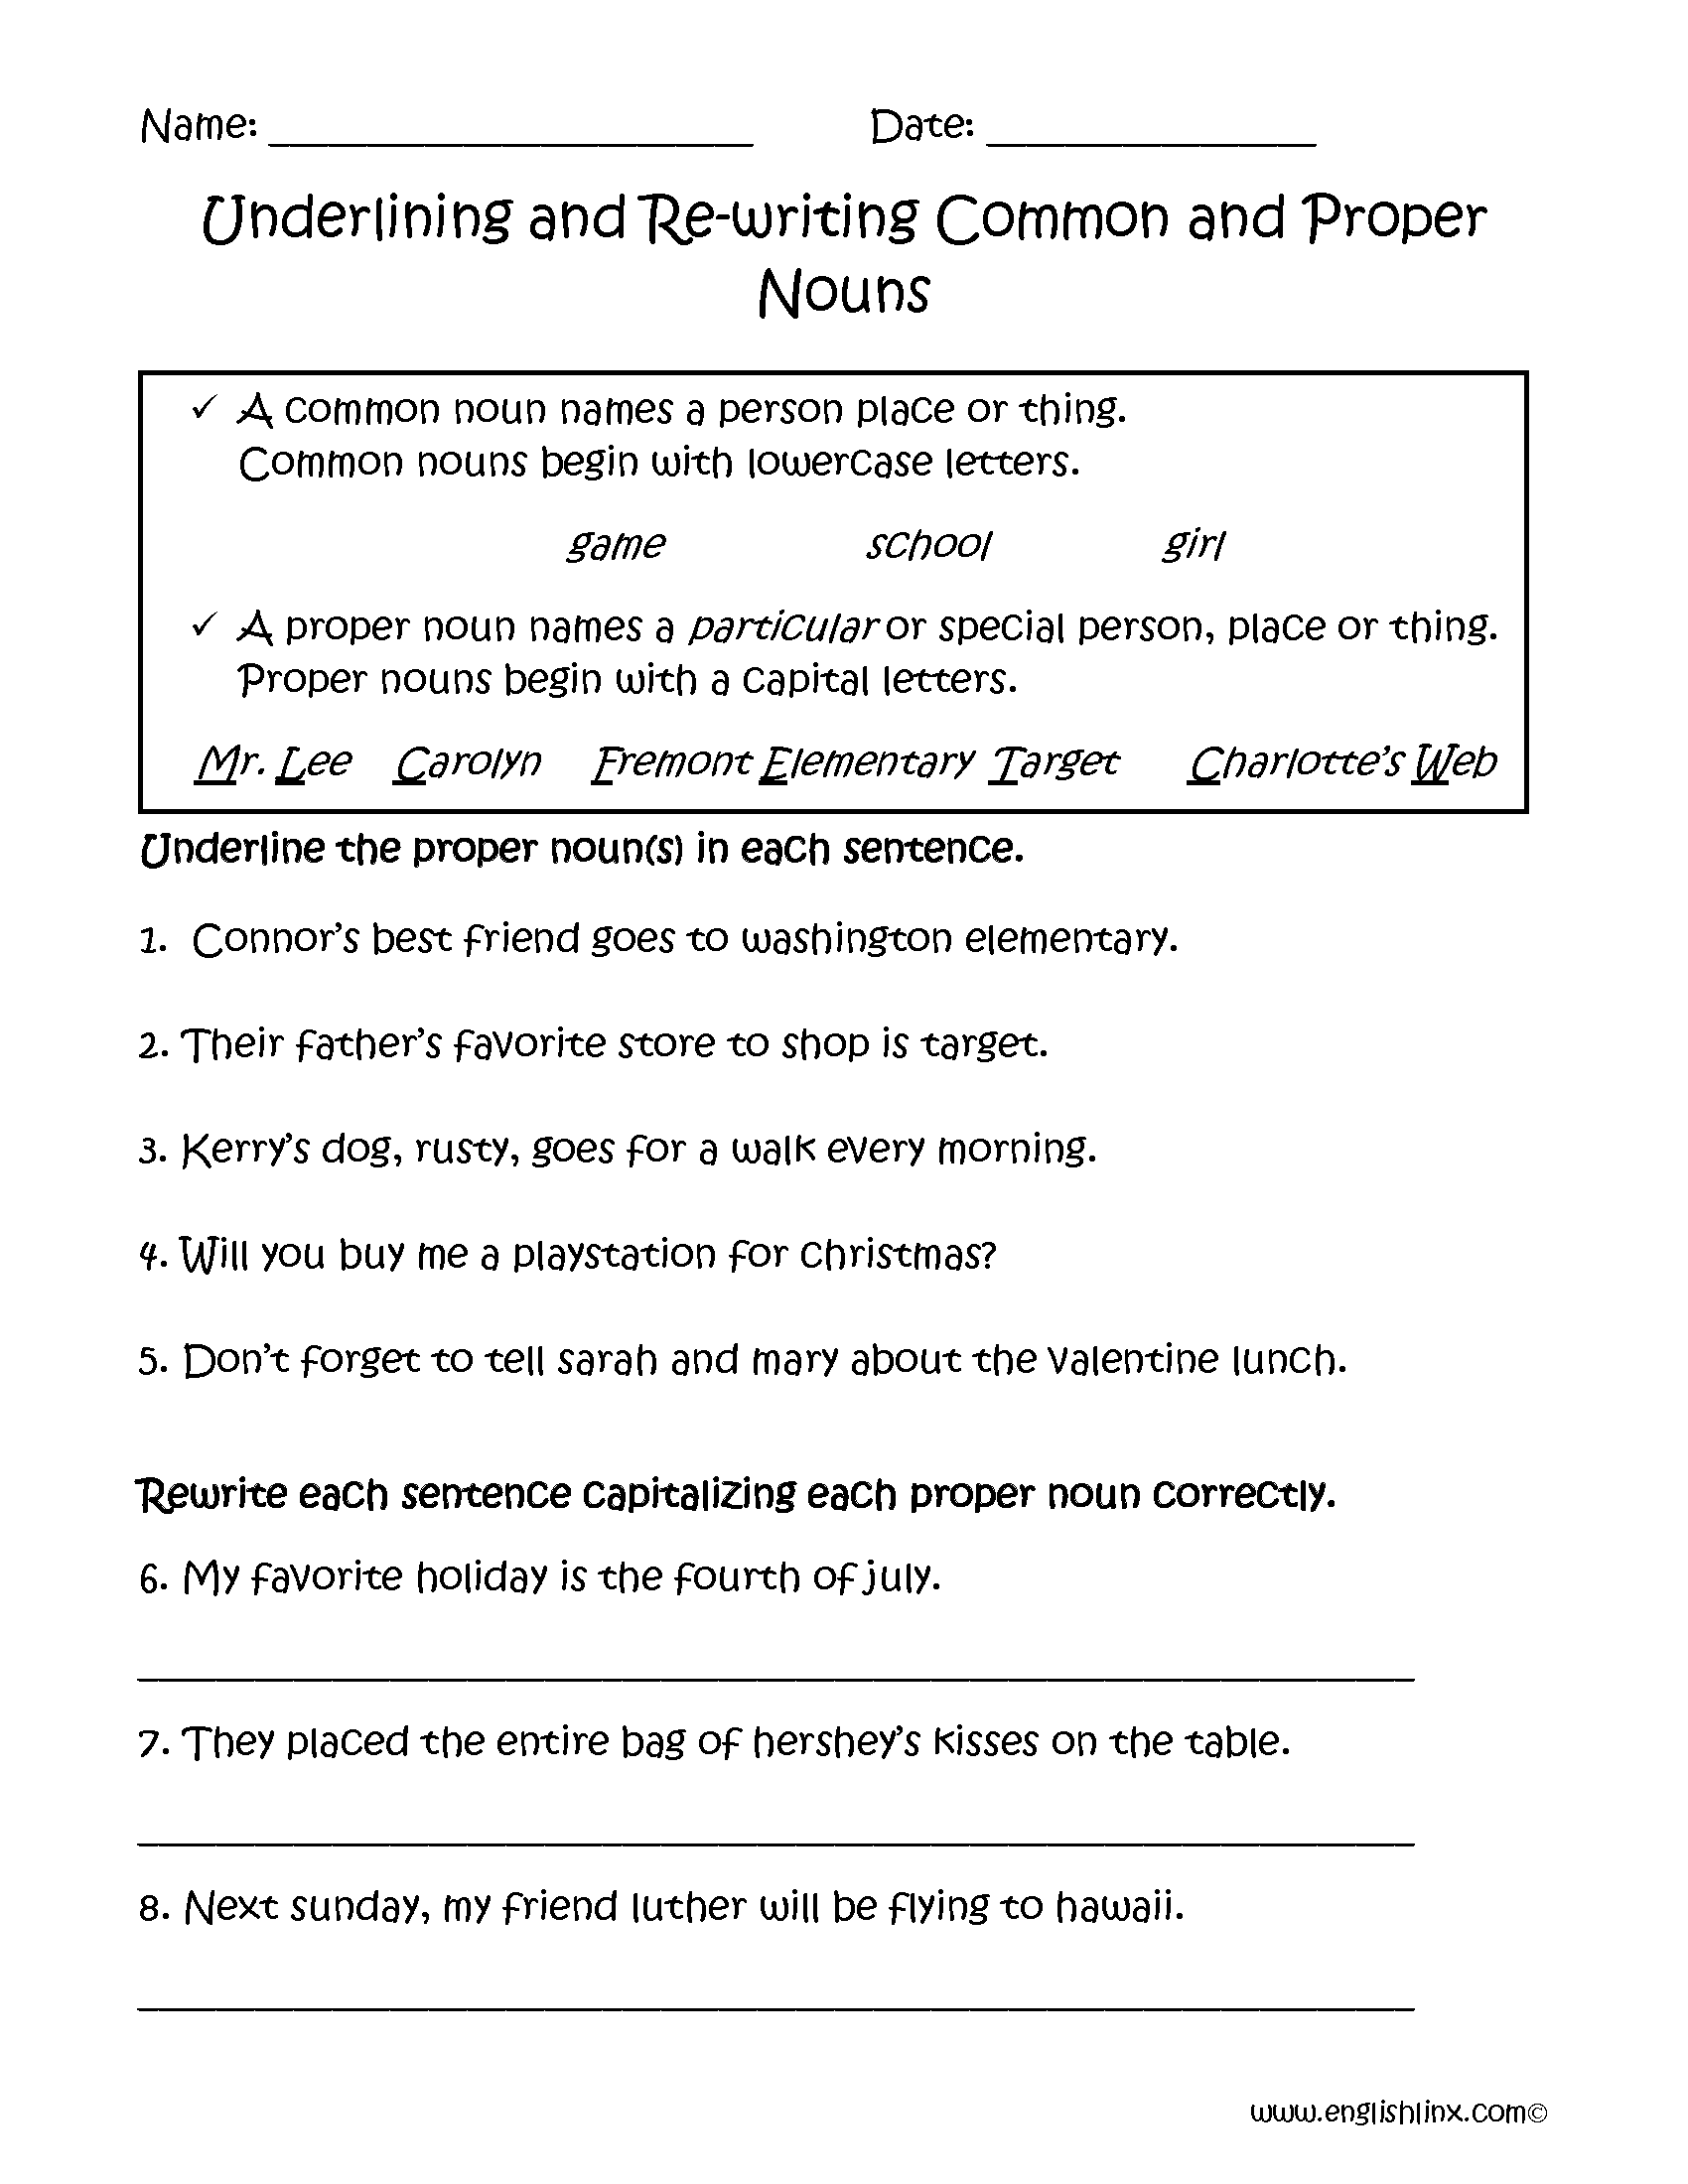 Common and proper noun exercises pdf